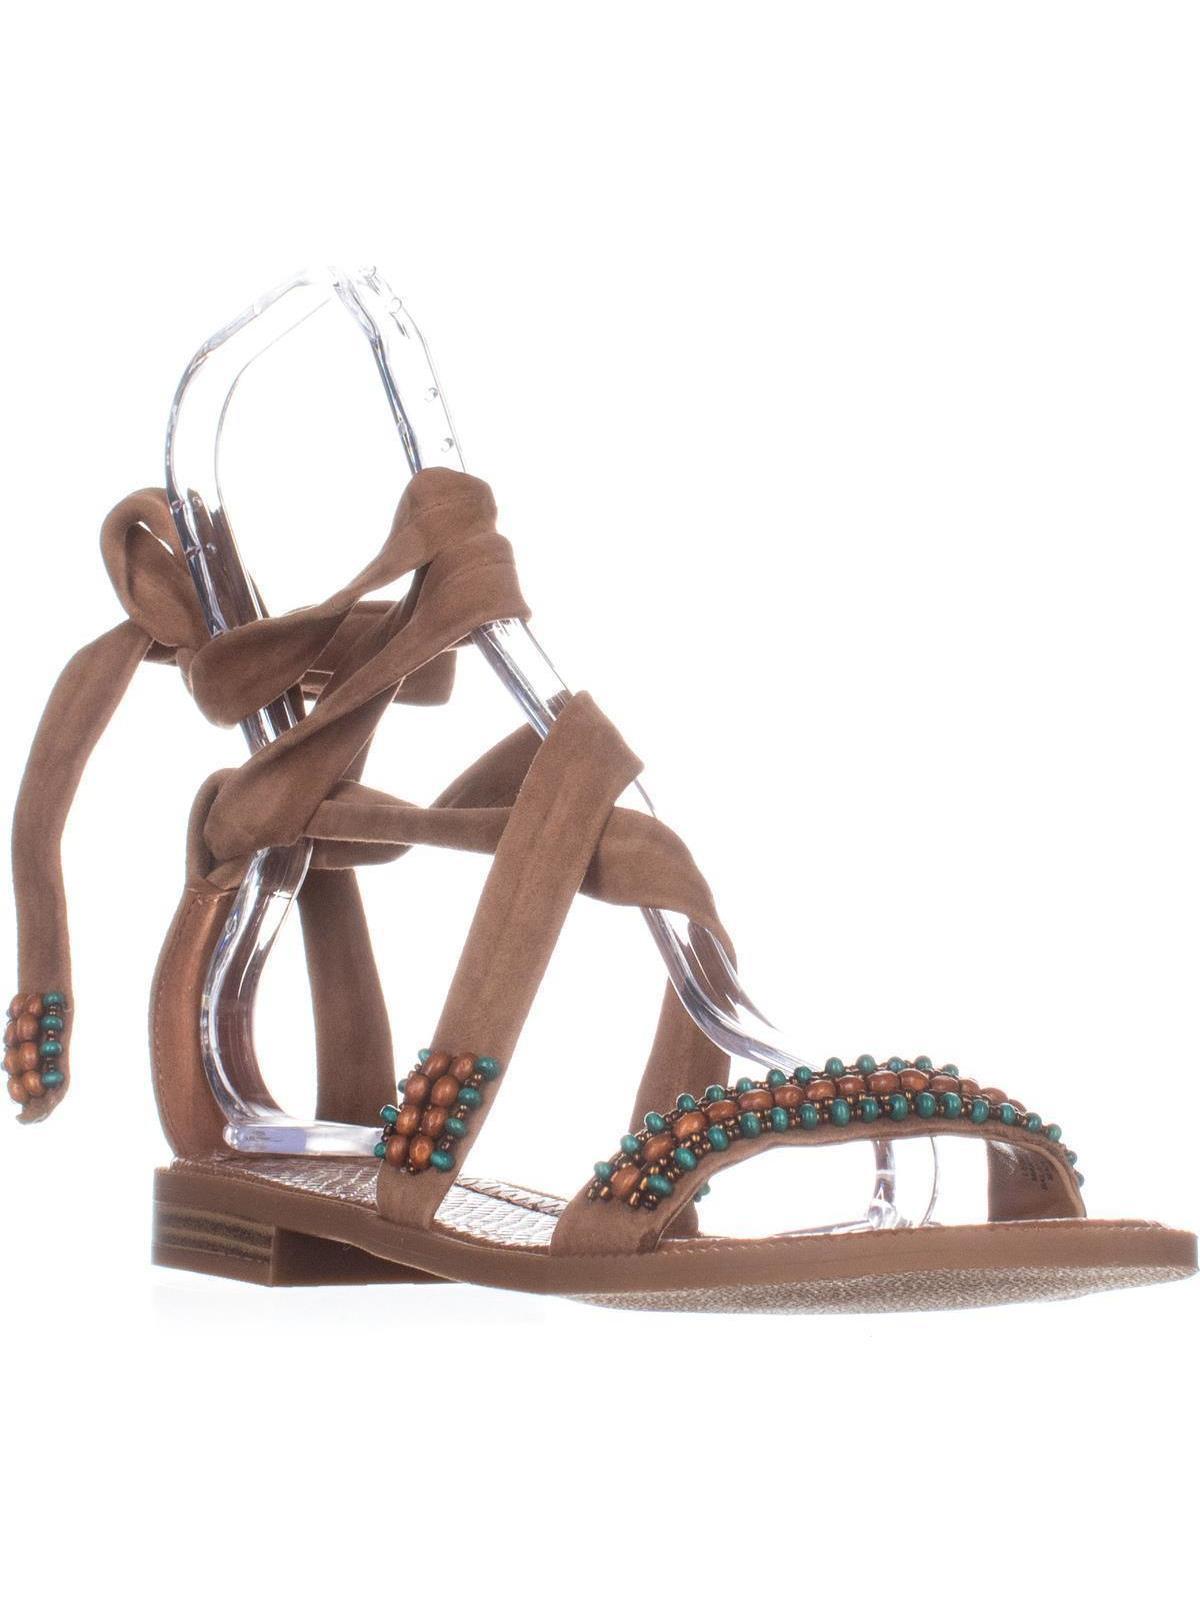 6be99b00d Nine west xoanna flat ankle strap sandals dark natural jpg 1200x1600 Nine  west sandals flat